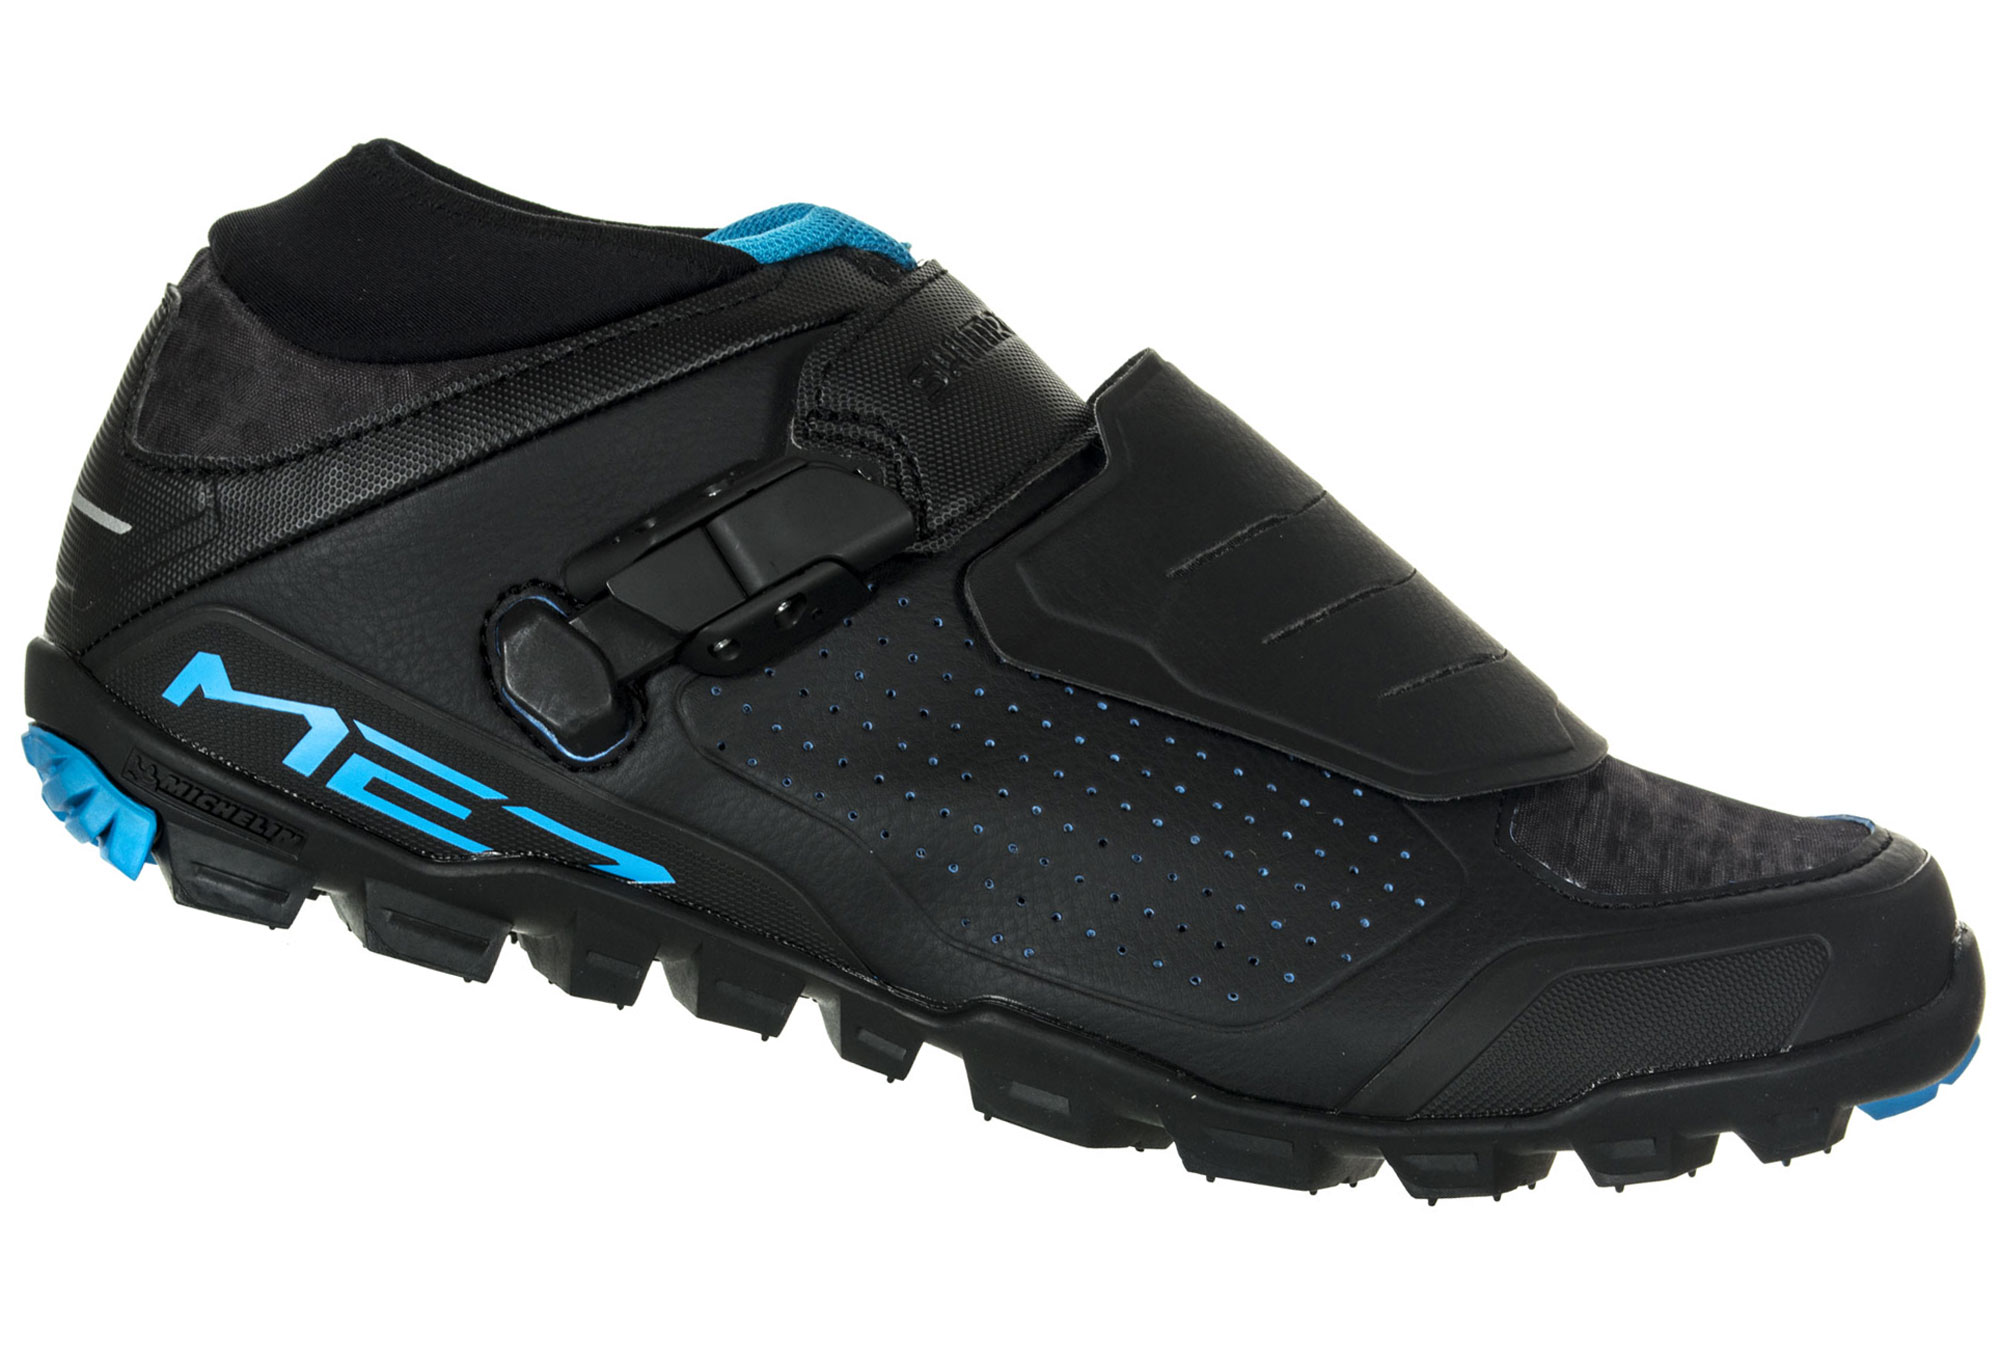 style de mode Conception innovante mode attrayante Chaussures VTT SHIMANO ME7 Noir